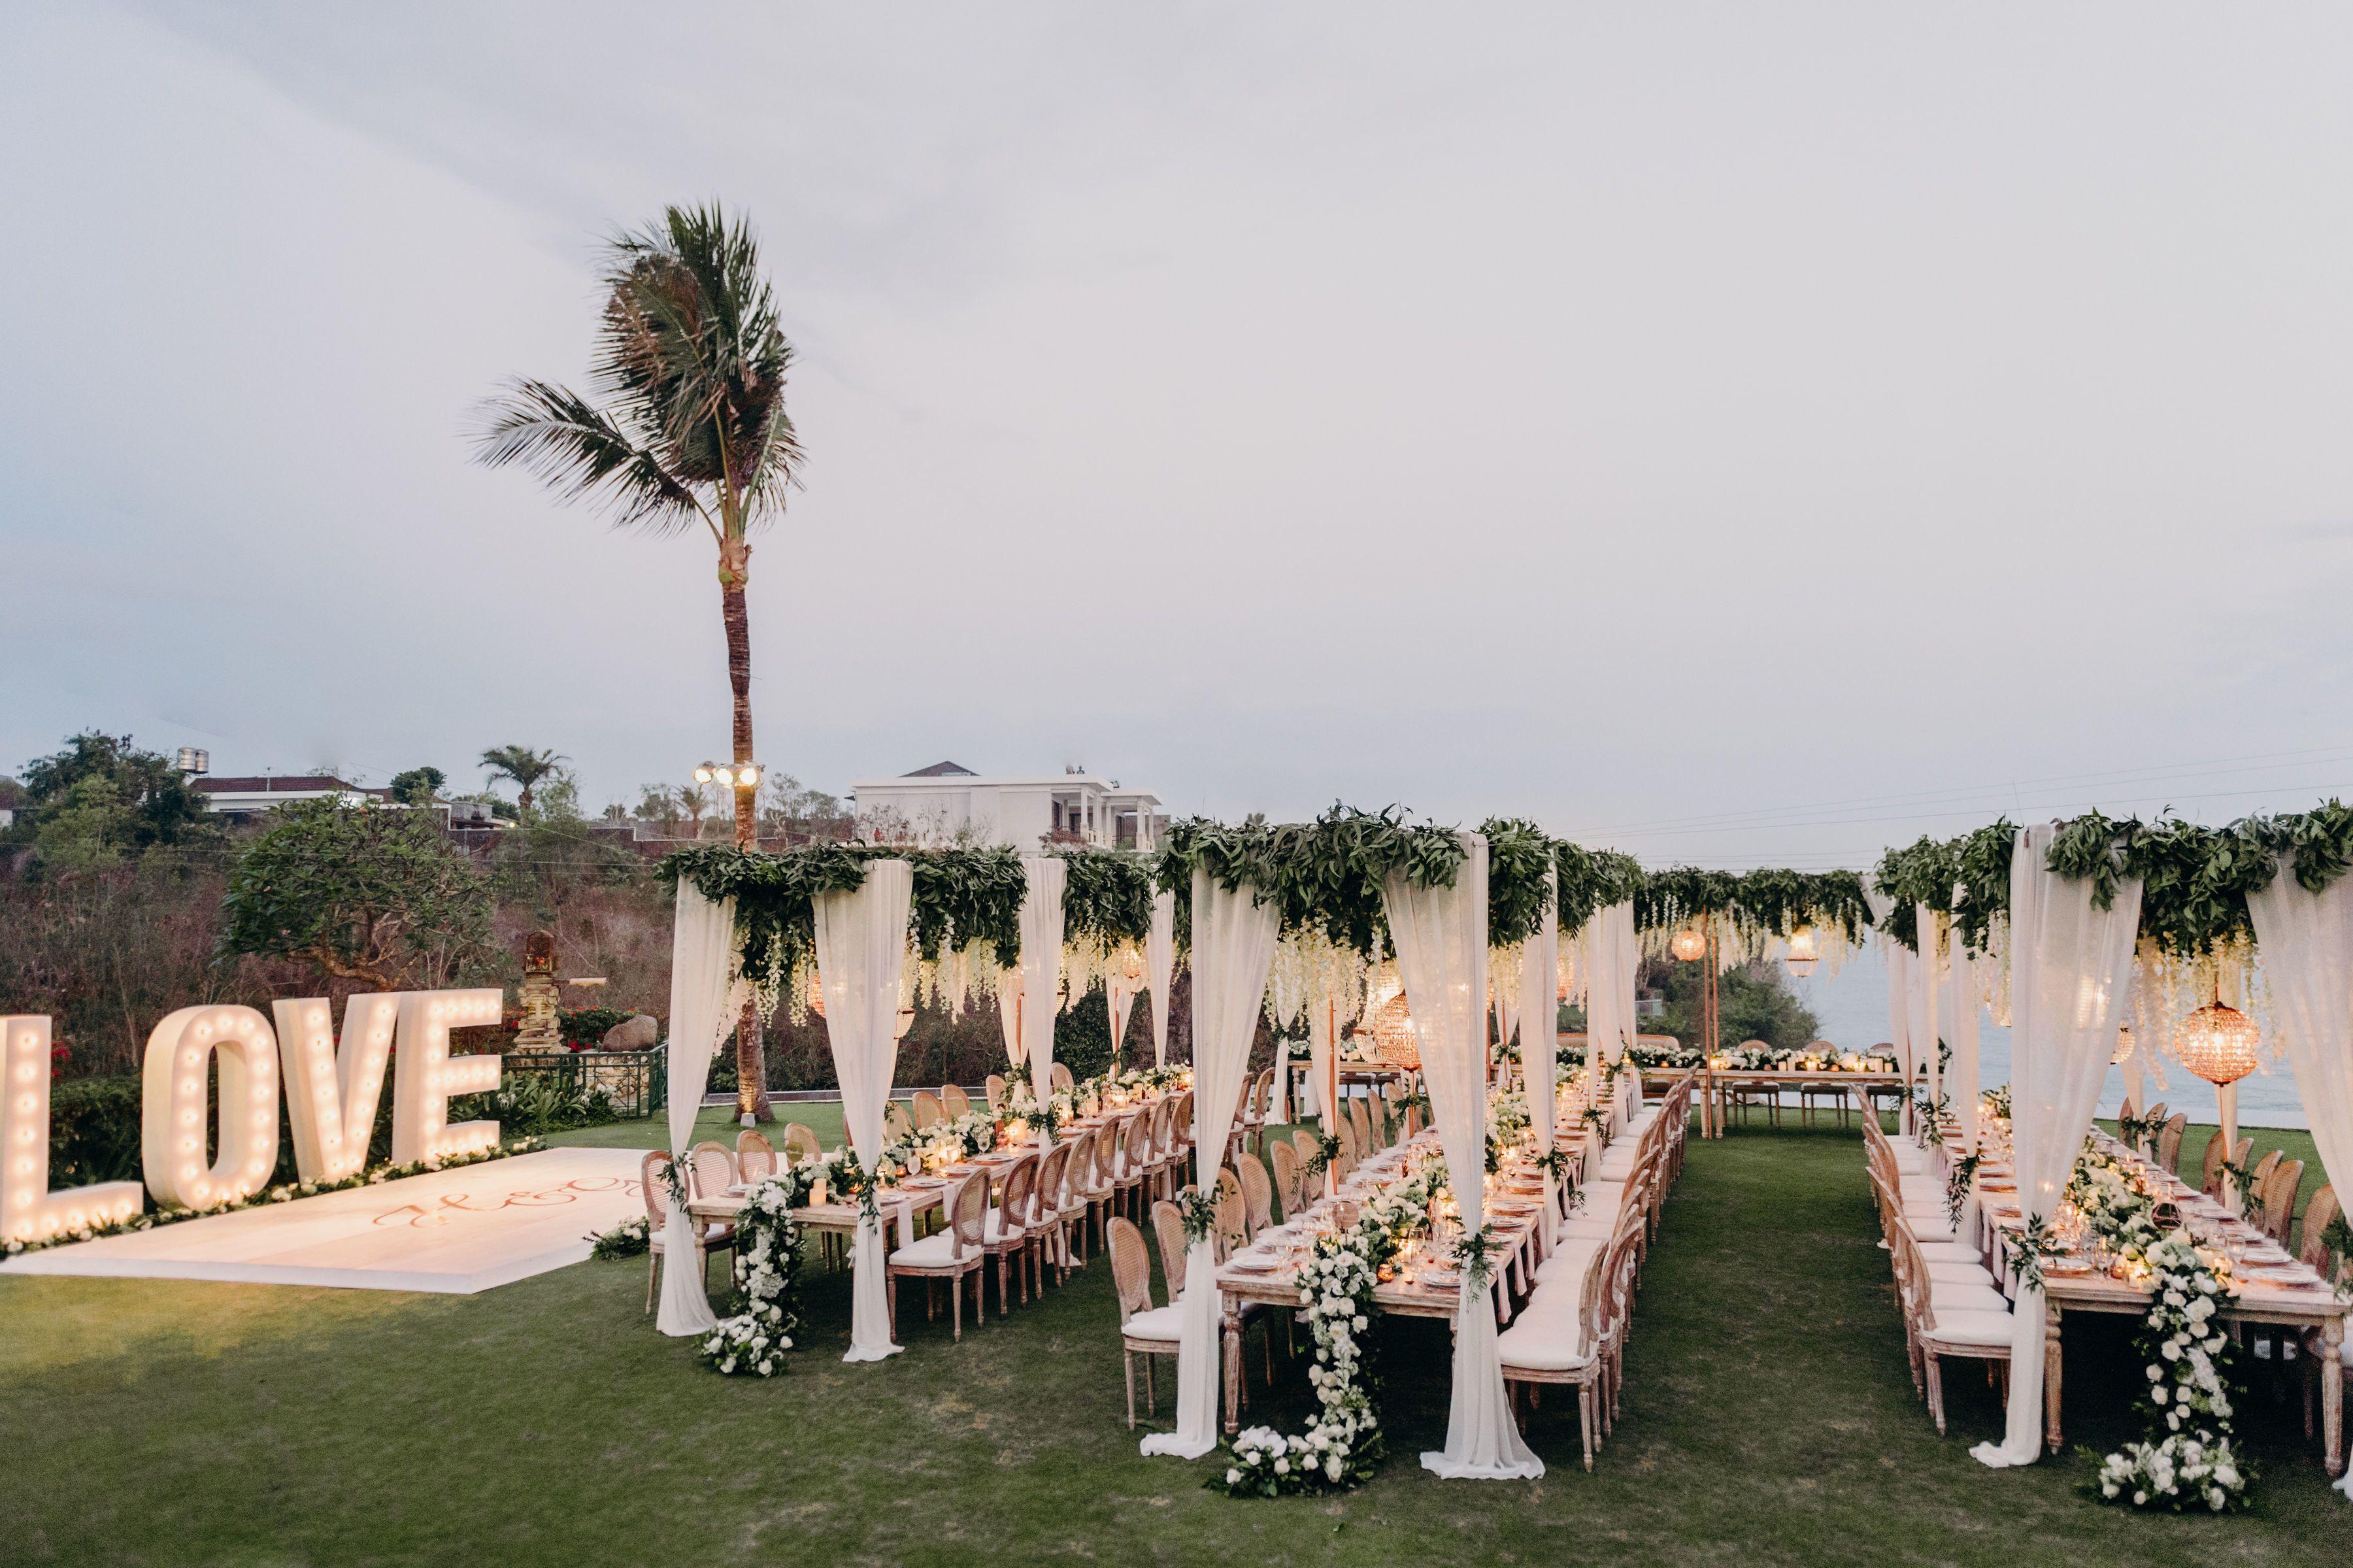 Read More Https Www Stylemepretty Com 2019 01 06 Hannah Polites Ties The Knot In Stunning Bali Outdoor Wedding Luxury Wedding Venues Beach Wedding Reception